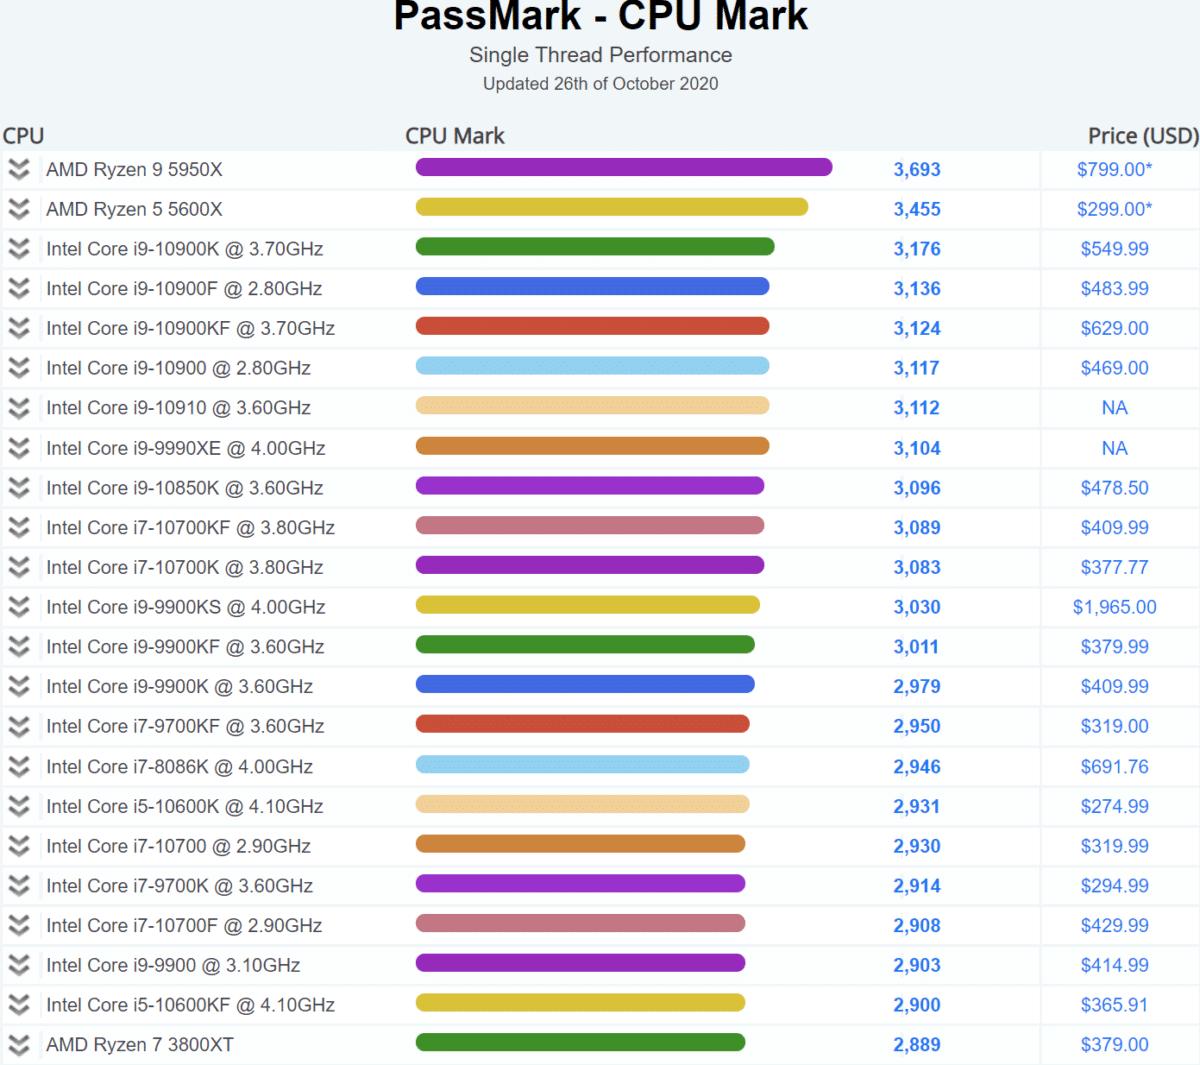 AMD Ryzen 9 5950X 16 Core Zen 3 Desktop CPU Passmark Single